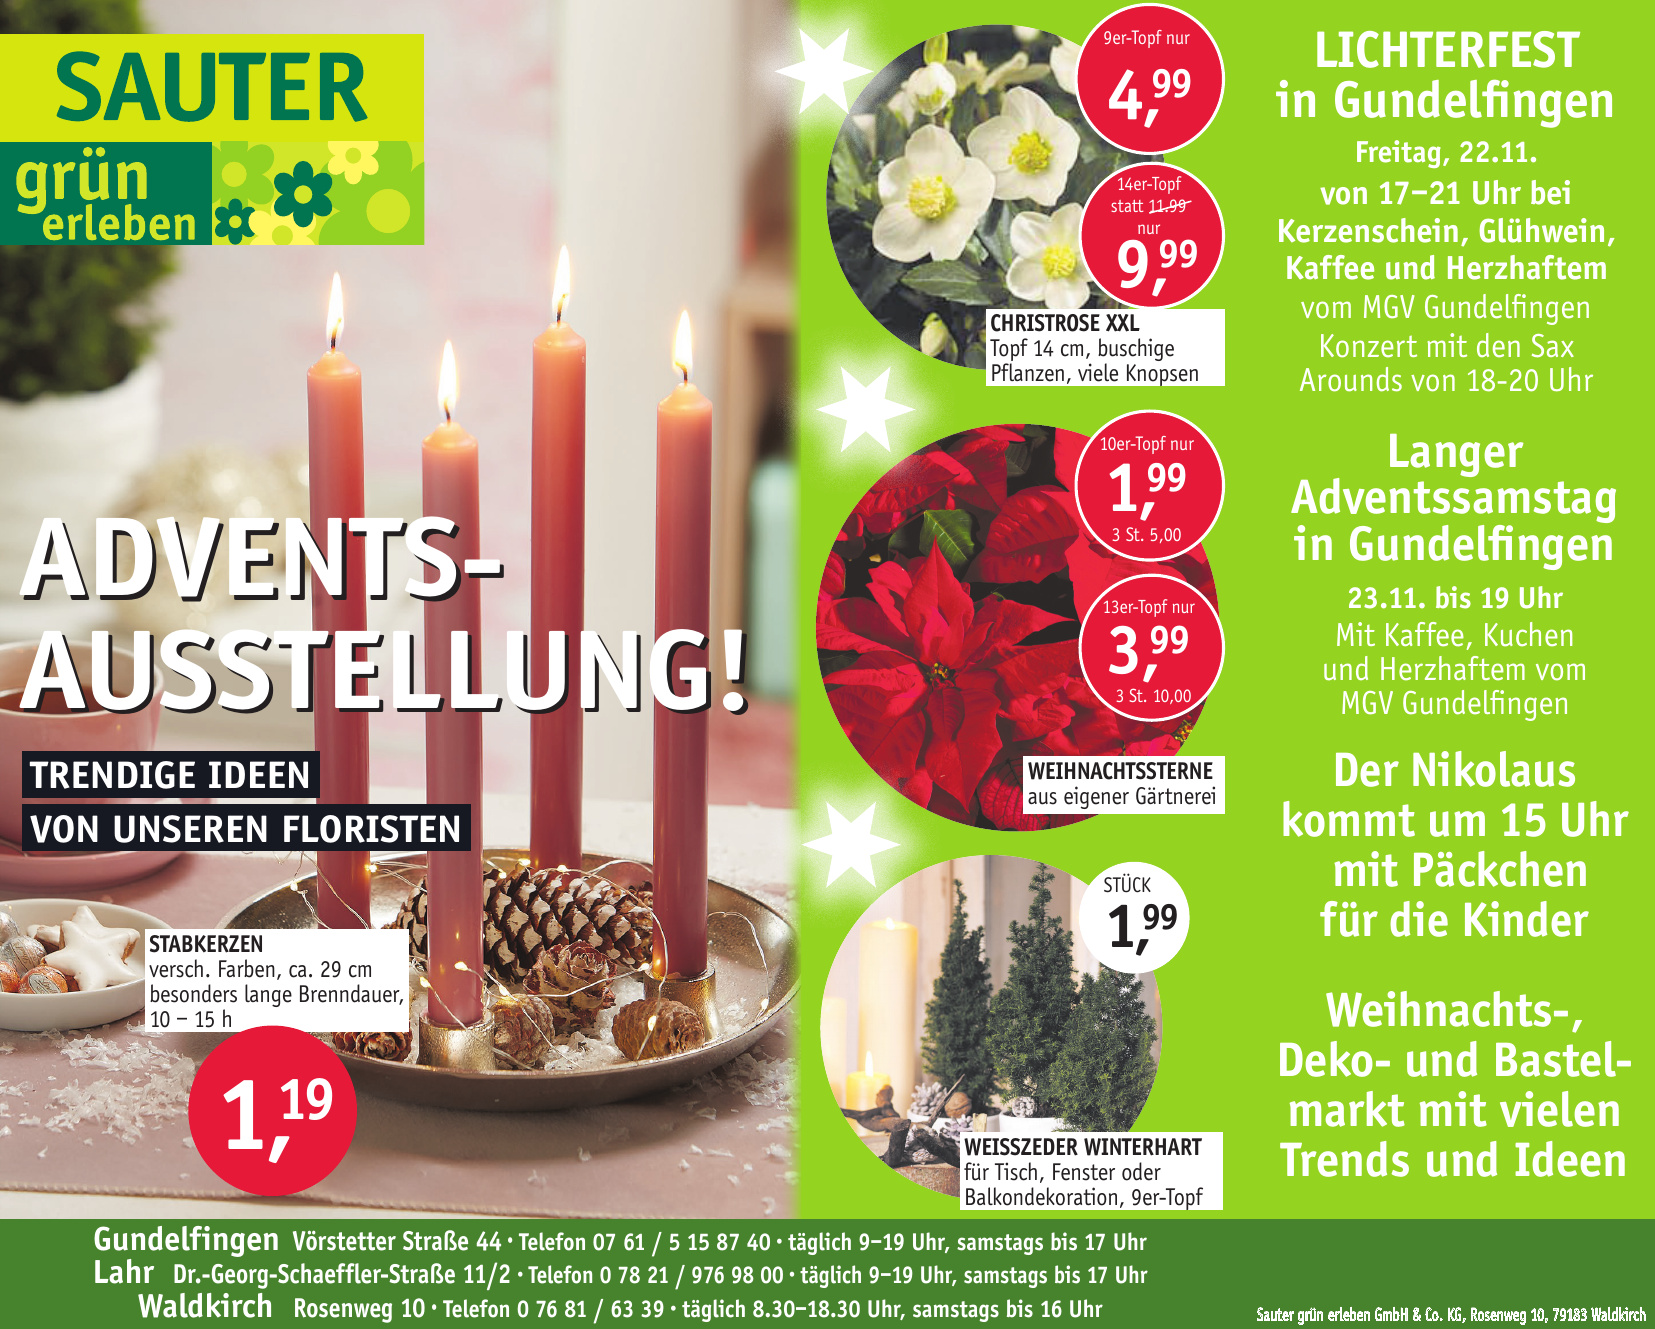 Sauter Grün erleben GmbH & Co. KG